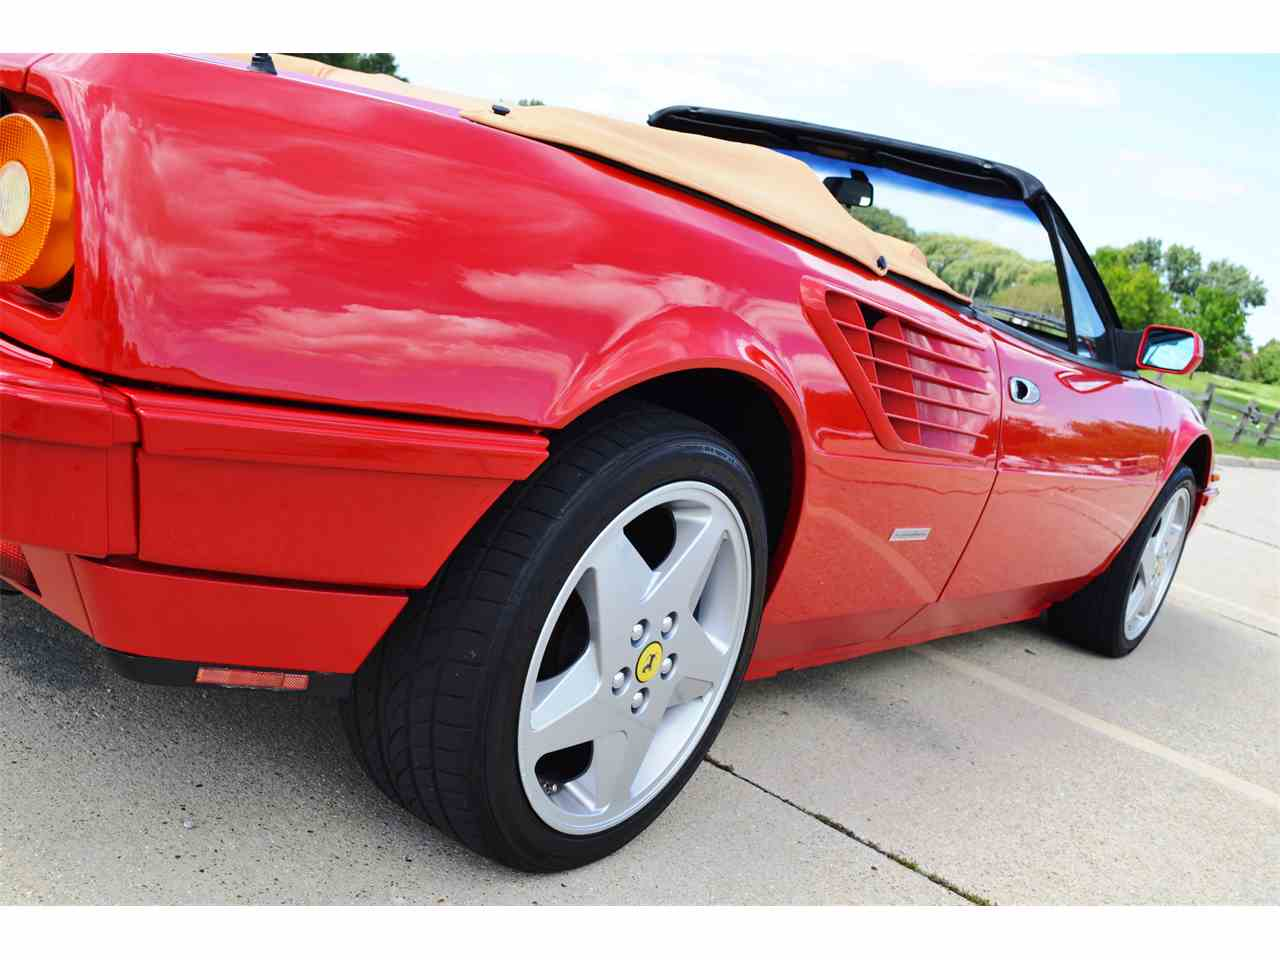 Large Picture of '85 Ferrari Mondial located in Illinois - JOFL